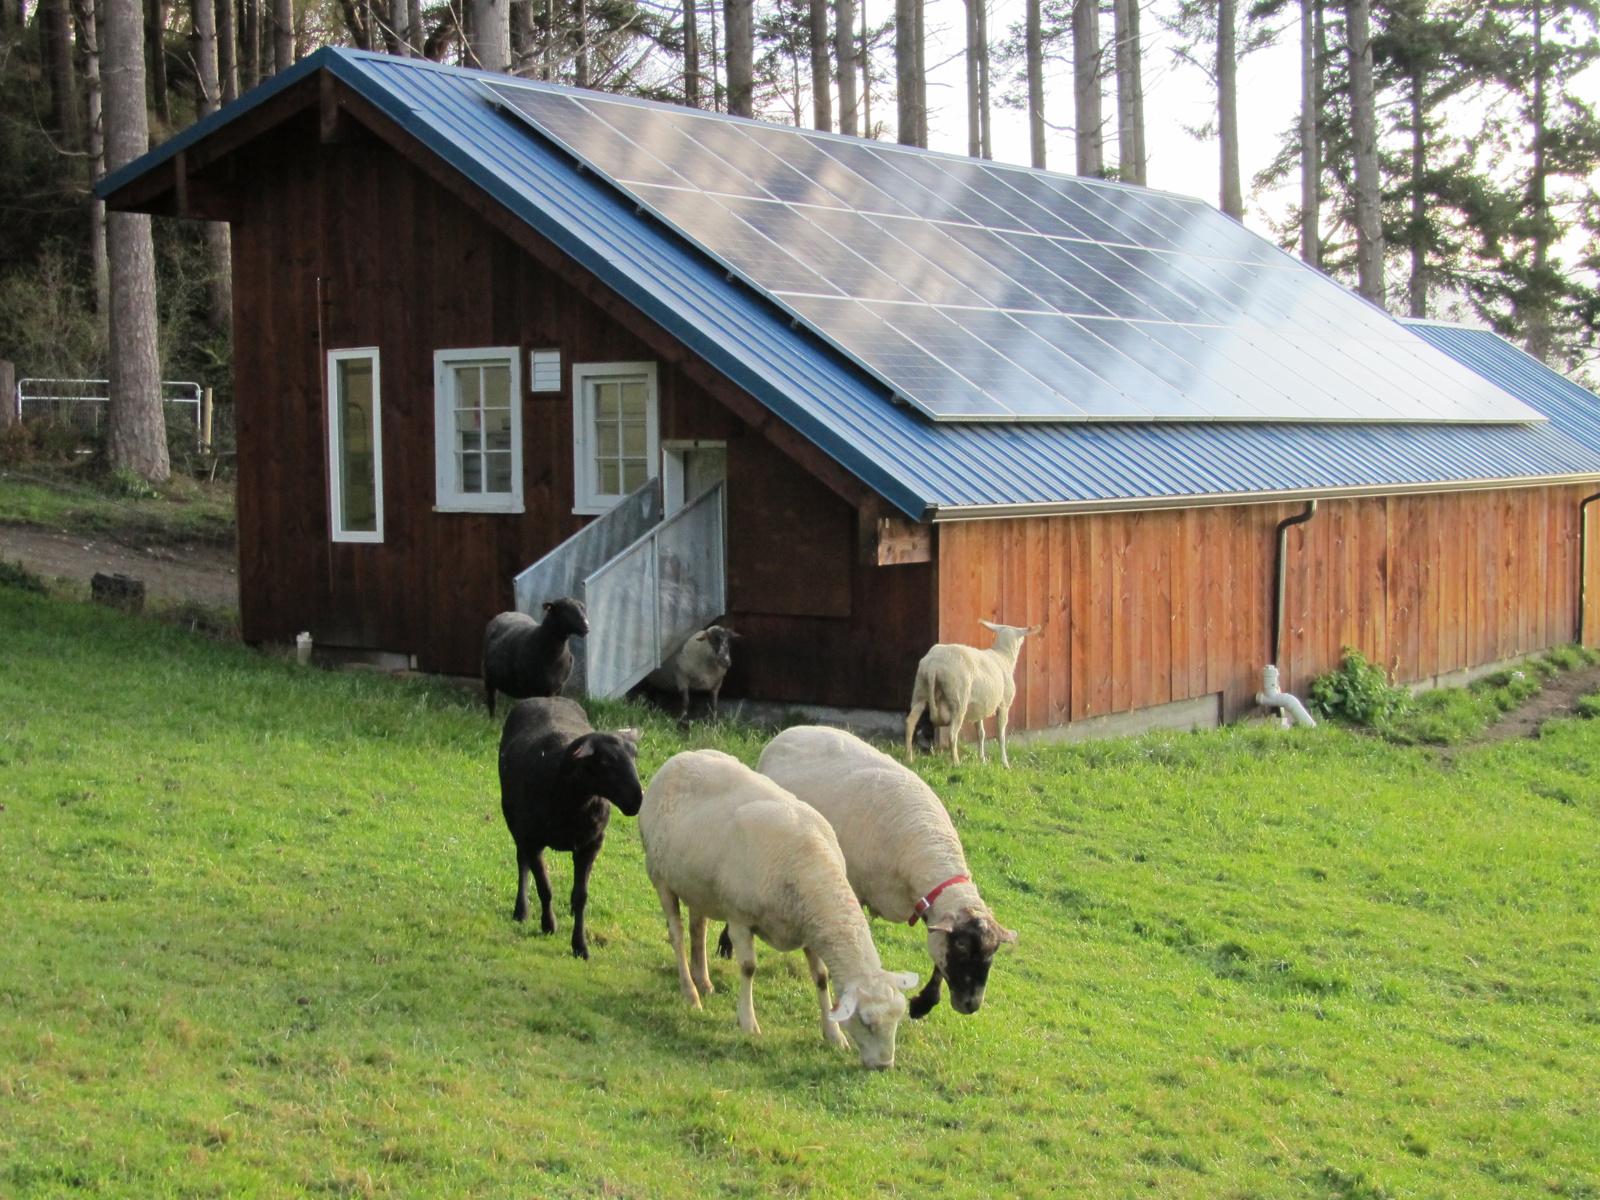 Ewes of Glendale Shepherd on Whidbey Island, Washington |  Read Our Maker Profile of Glendale Shepherd's Lynn Swanson